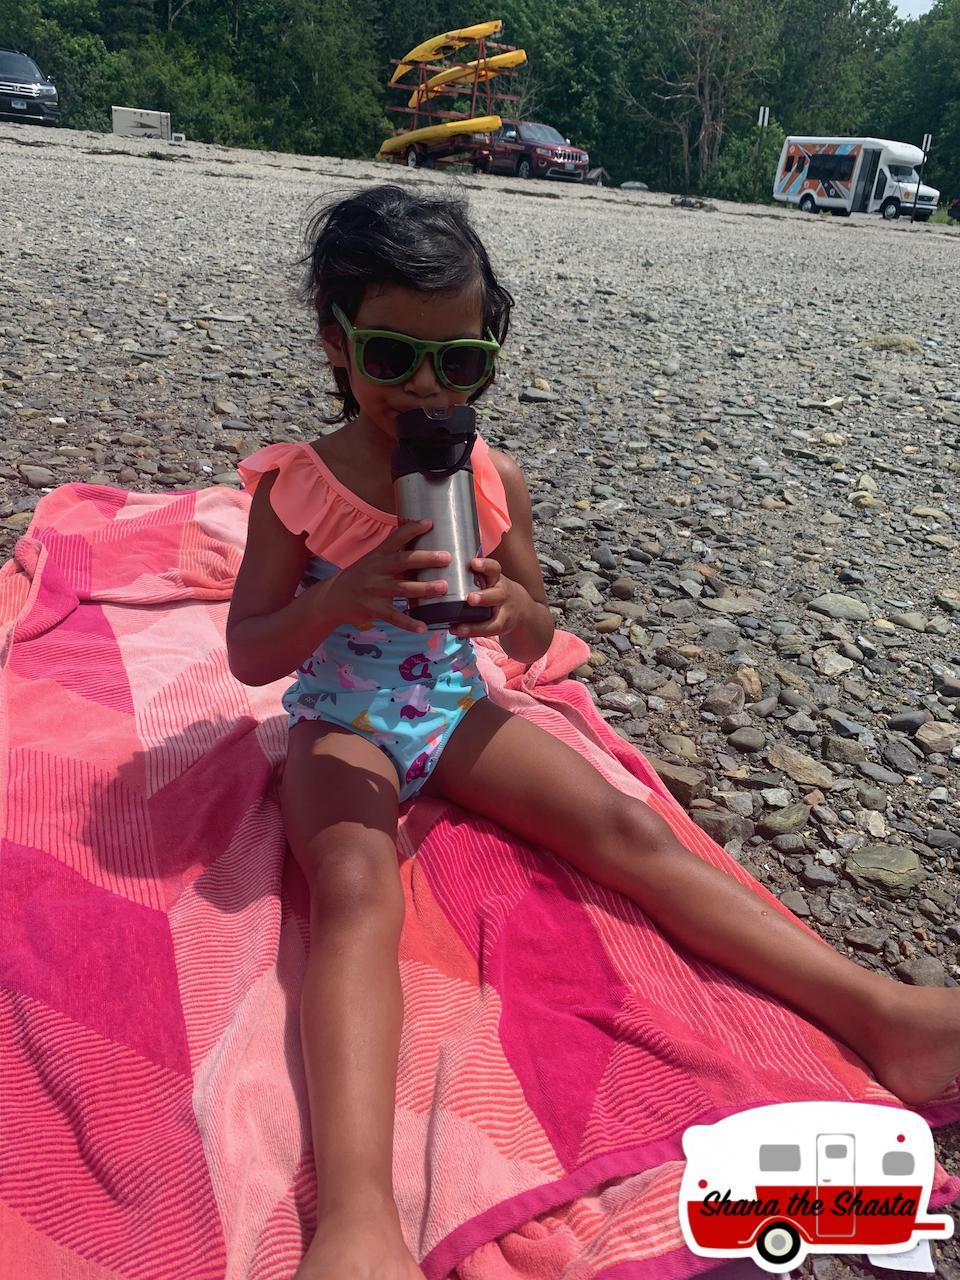 Hadley-Point-Beach-Babe